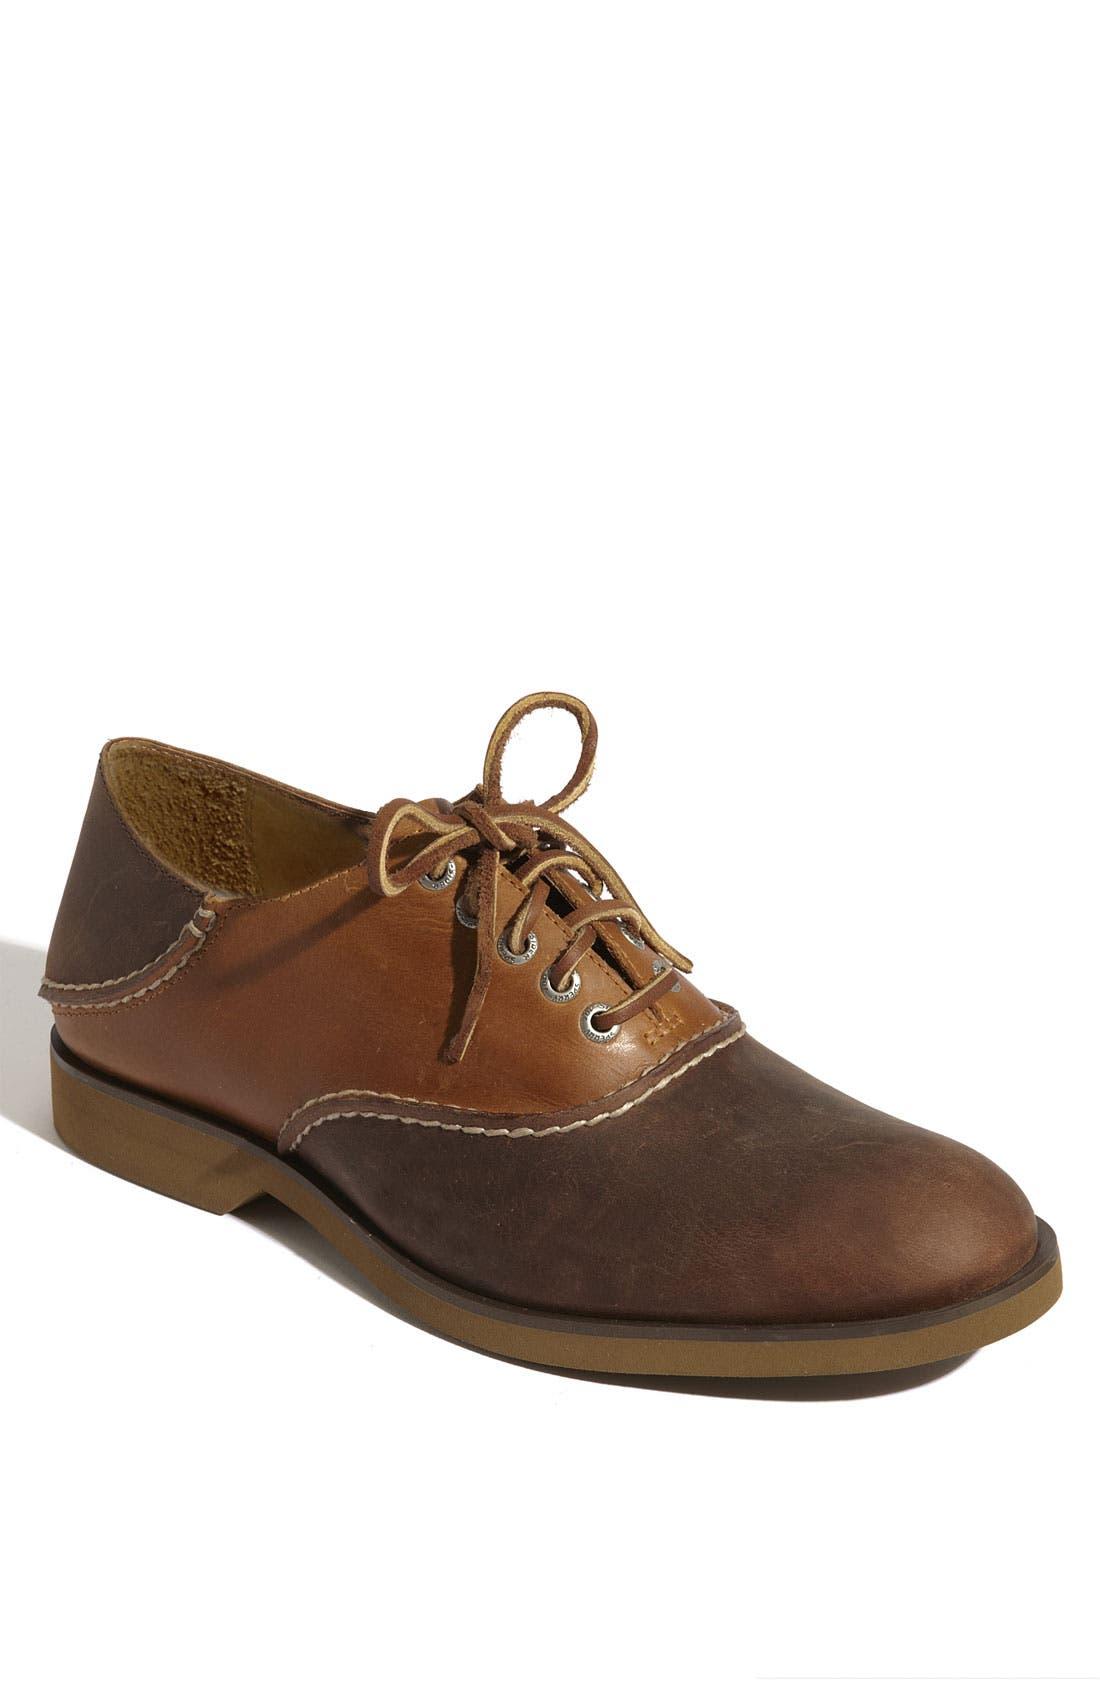 Alternate Image 1 Selected - Sperry Top-Sider® 'Boat' Oxford Saddle Shoe